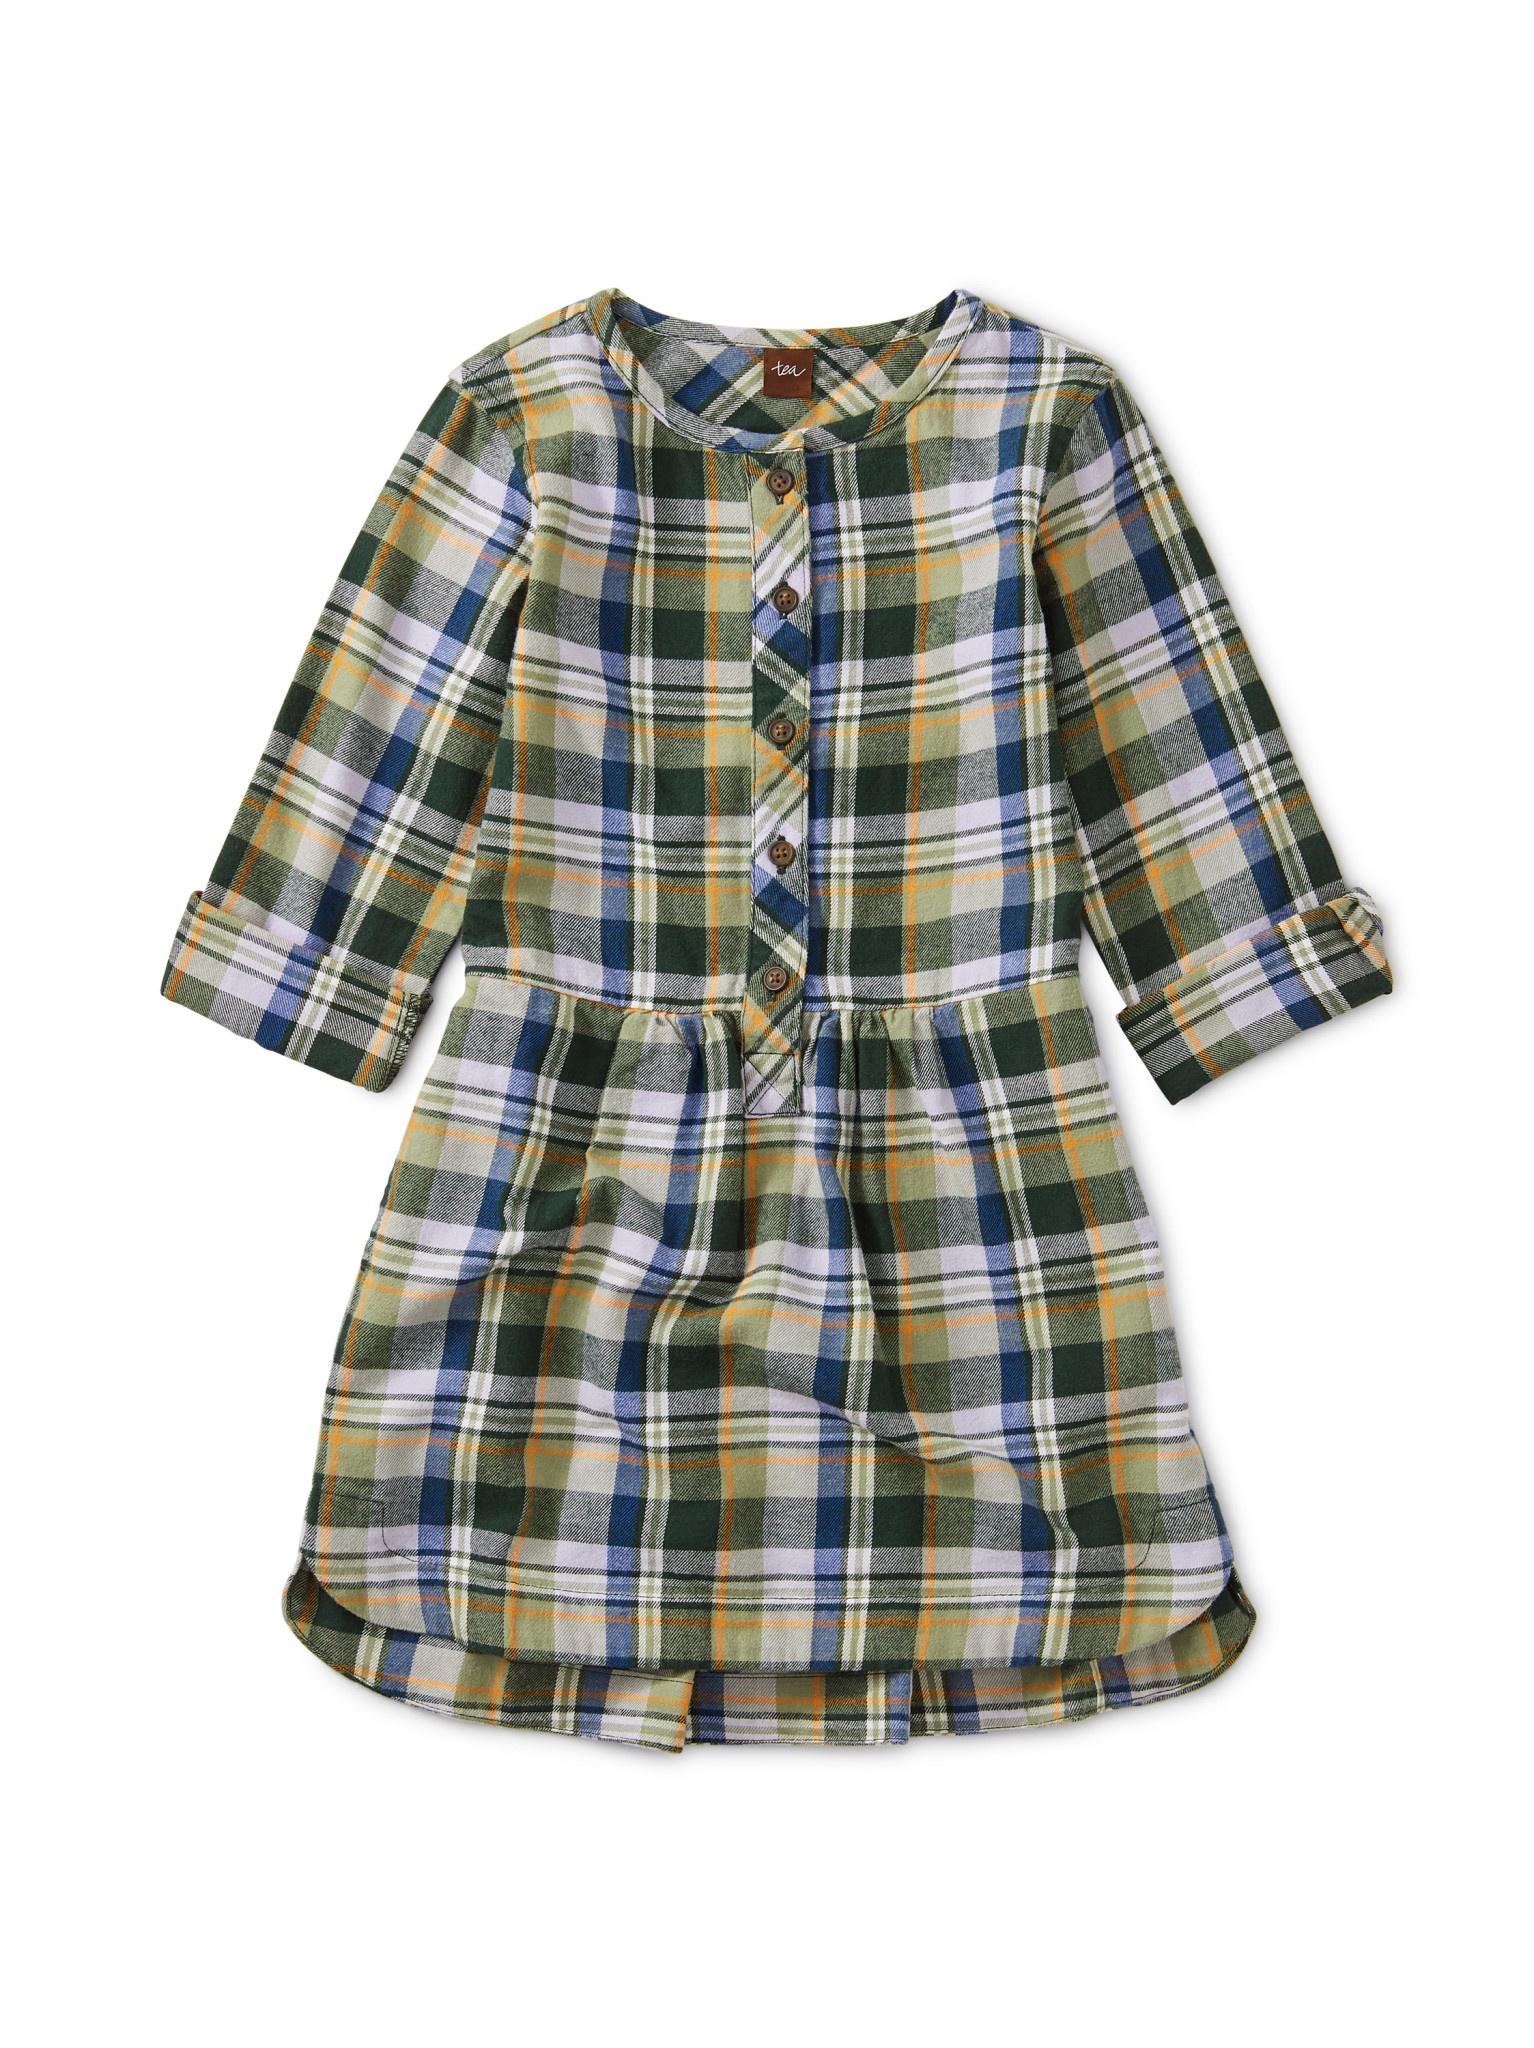 Tea Collection Everest Plaid Shirtdress